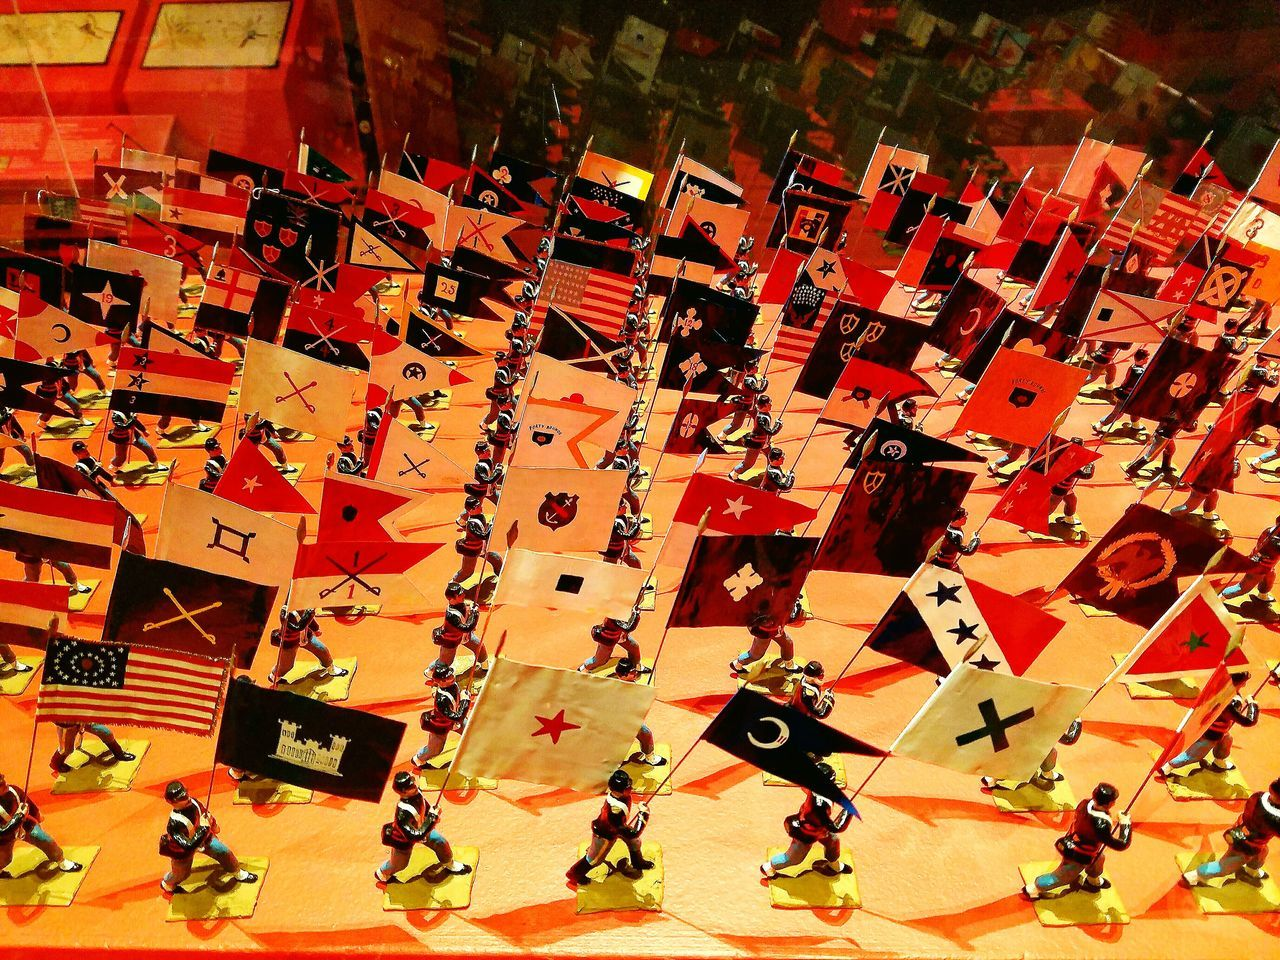 Miniature Civil War Regiment Flags- The Heritage Museum and Garden Sandwich Mass HeritageMuseum Miniature Civil War Museum Display